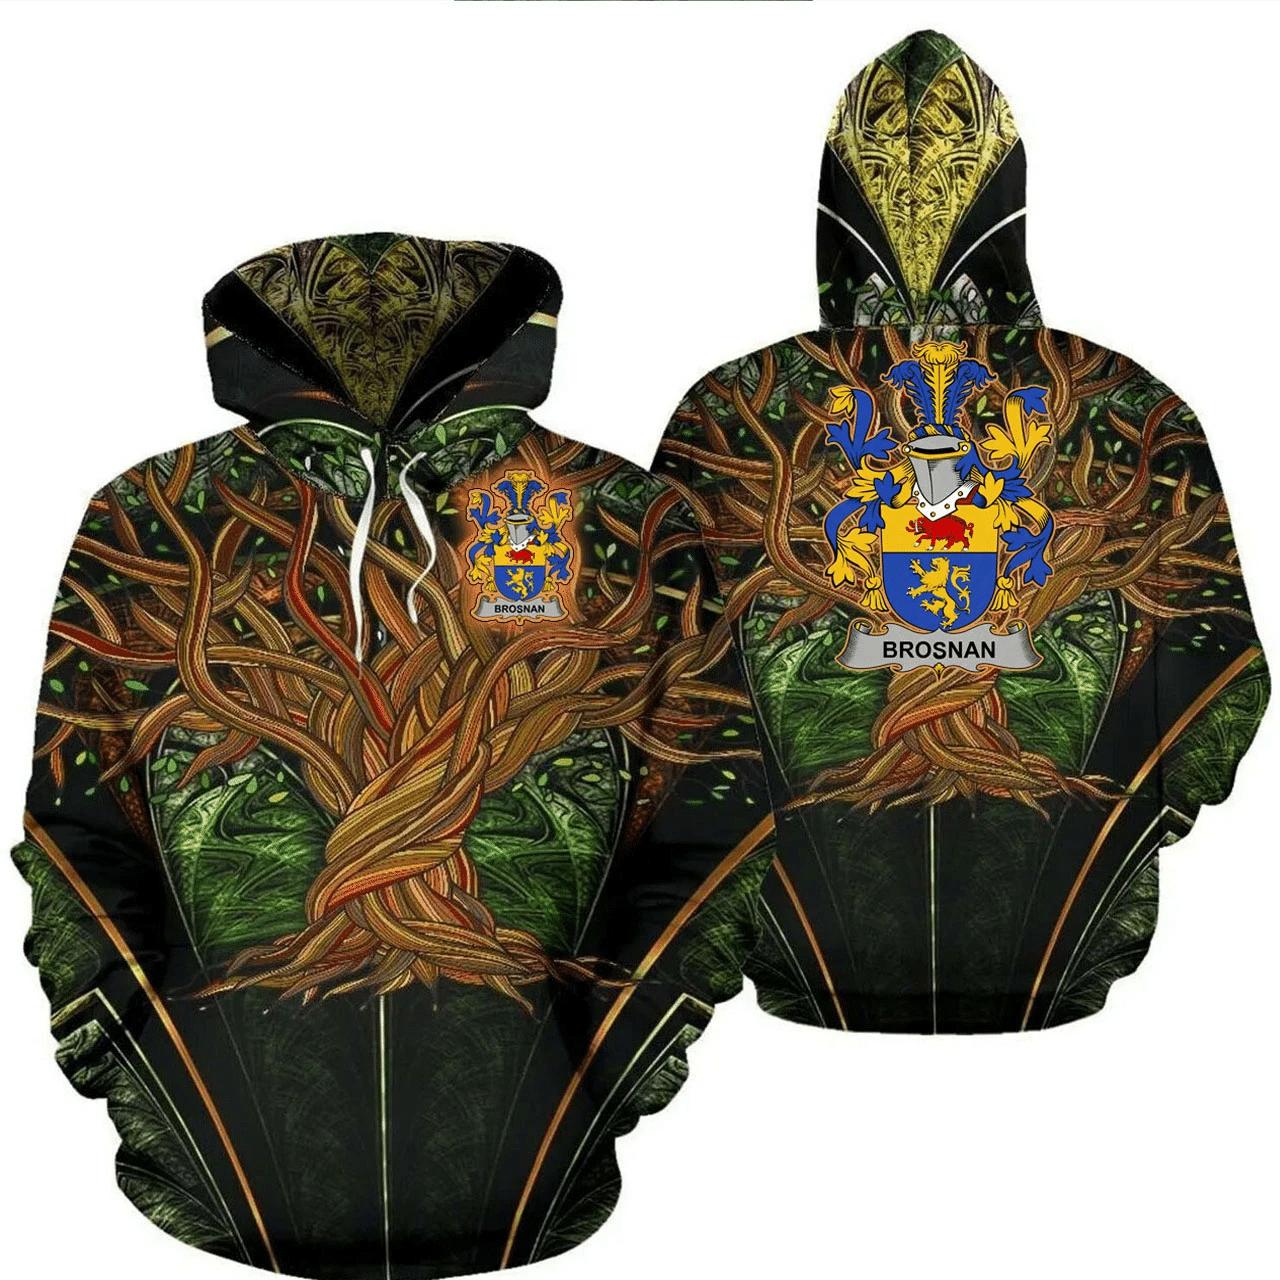 1stIreland Ireland Hoodie - Brosnan or O'Brosnan Irish Family Crest Hoodie - Tree Of Life A7